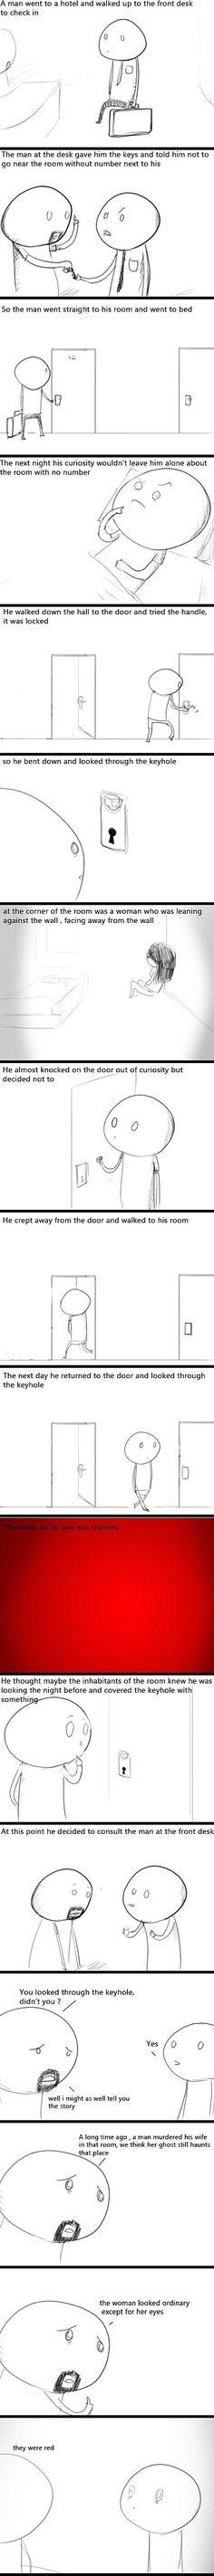 Ha I like the drawings on the last one he's just like...well dang